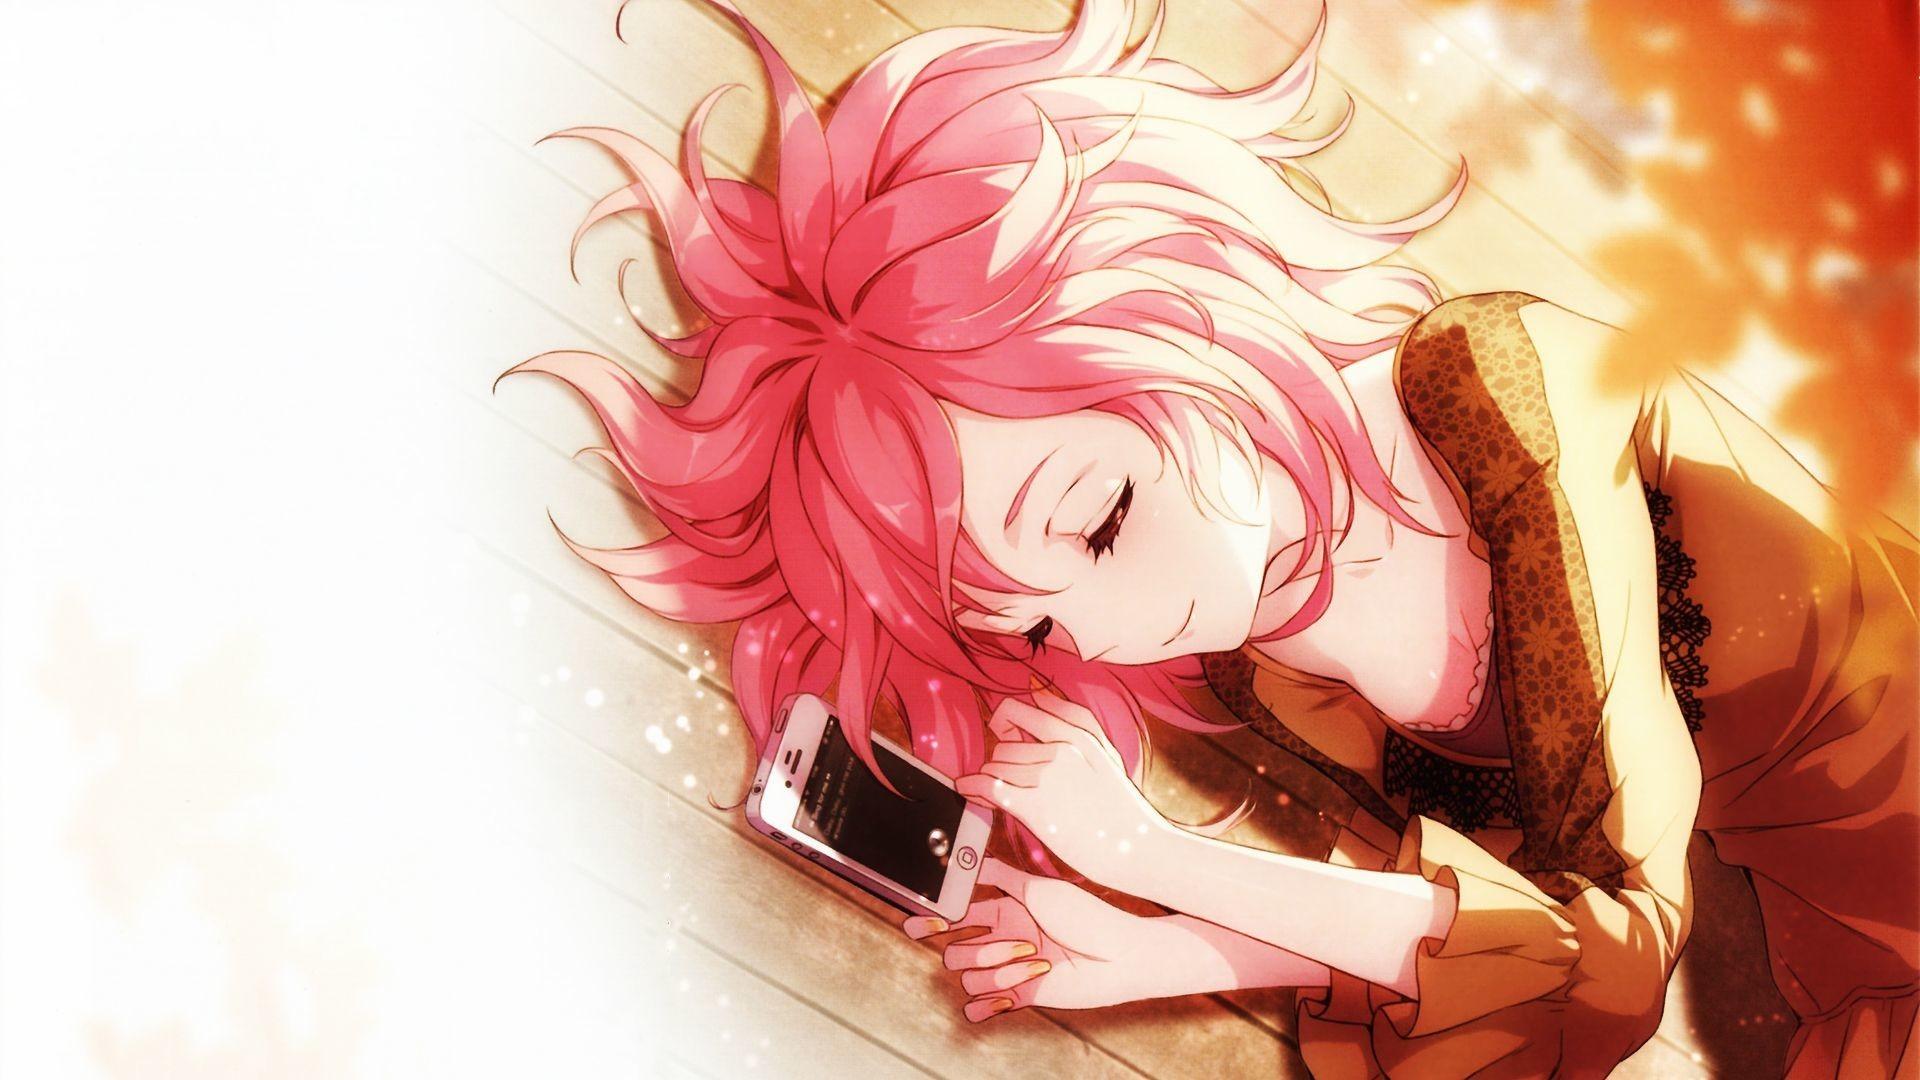 Download 1k Mikasa Ackerman Kawaii Anime Girl Sleeping With Phone 1920x1080 Wallpaper Teahub Io